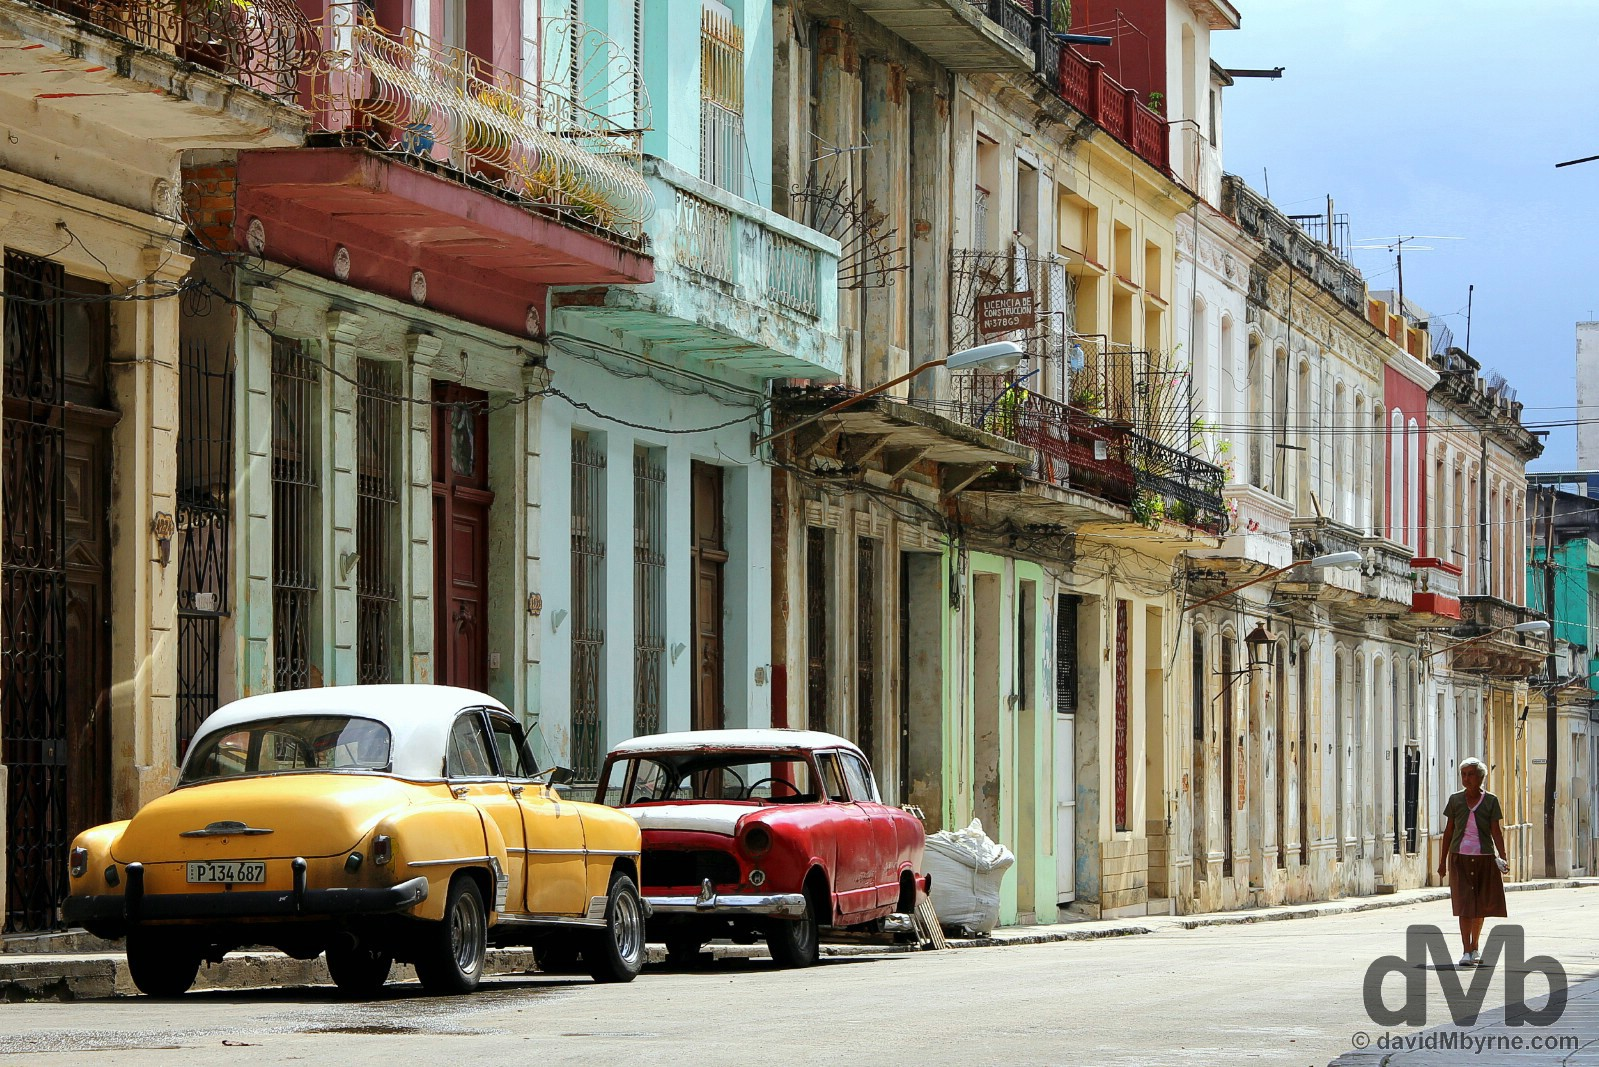 Havana, Cuba. May 1, 2015.